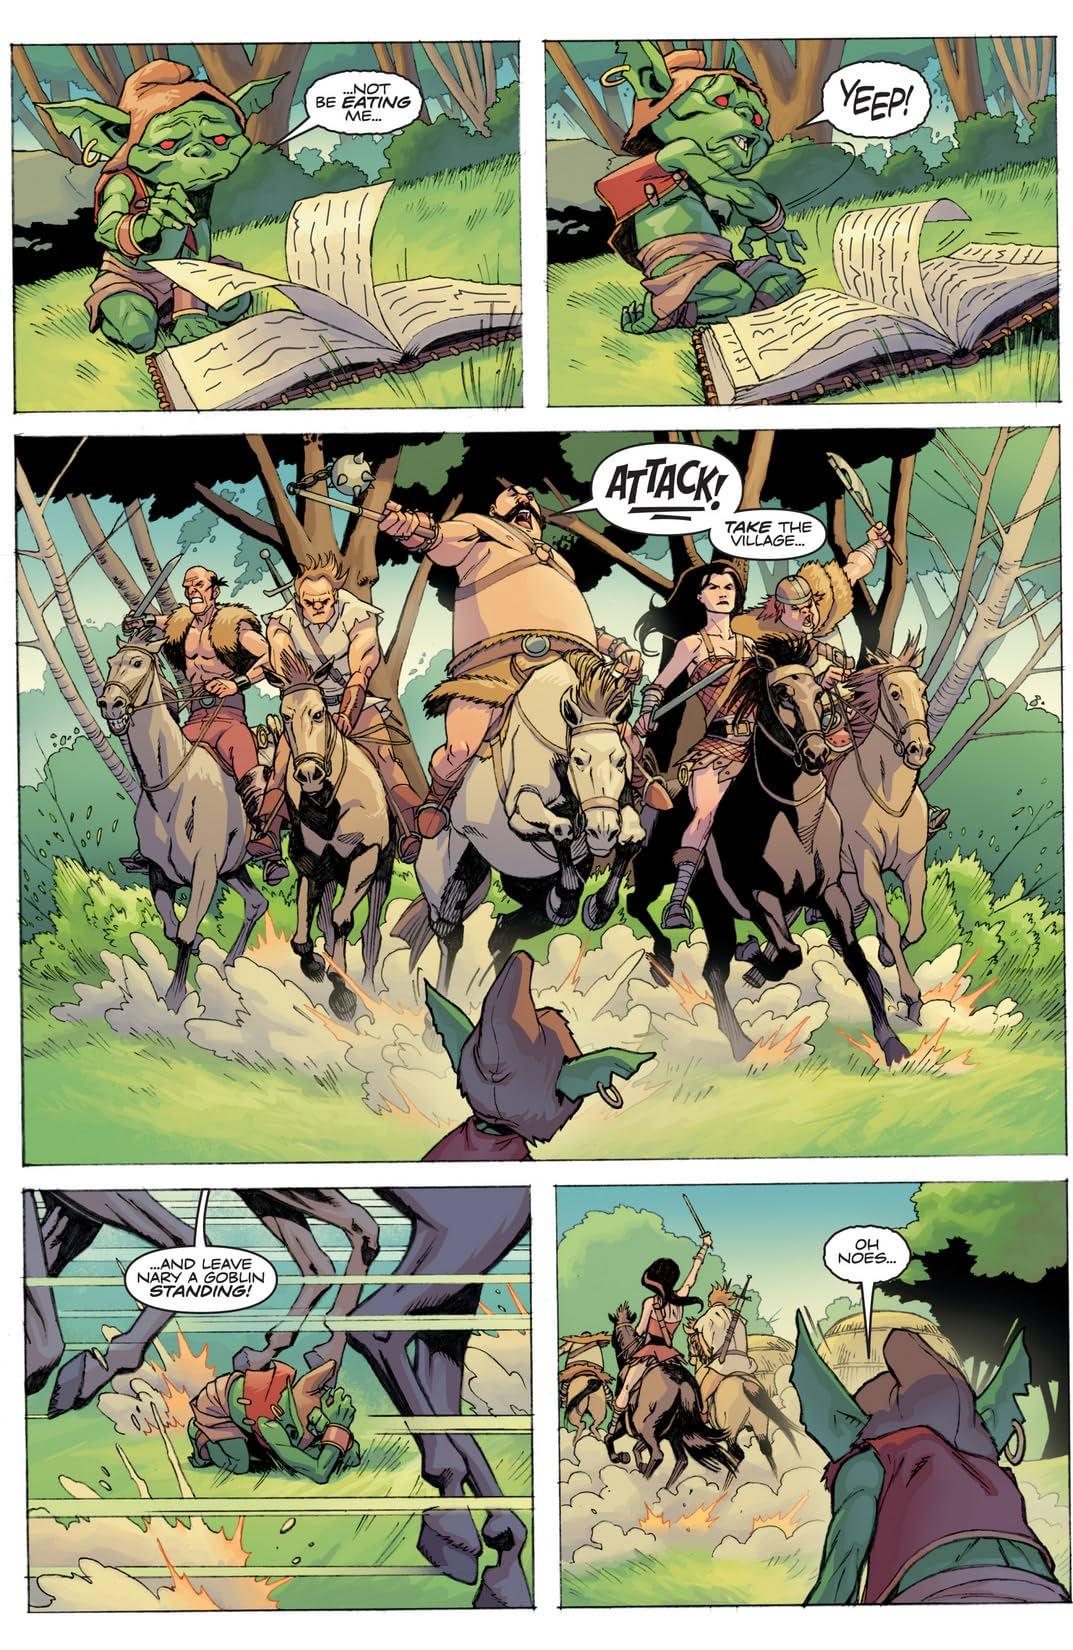 Pathfinder: Goblins! #3 (of 5)